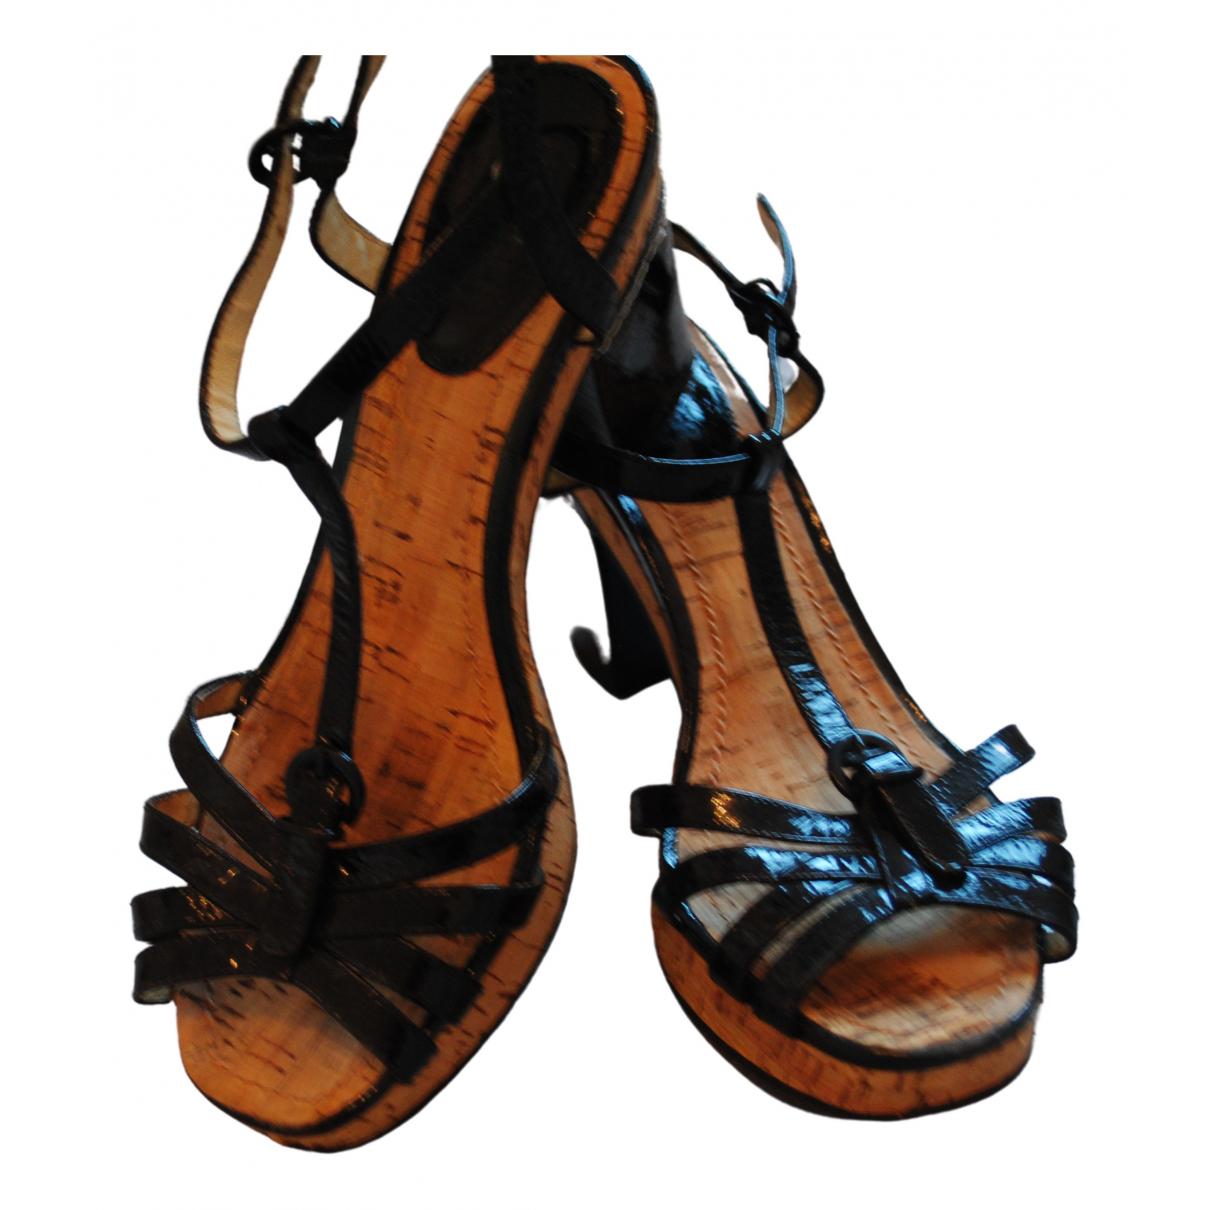 Tommy Hilfiger \N Black Patent leather Sandals for Women 39 EU